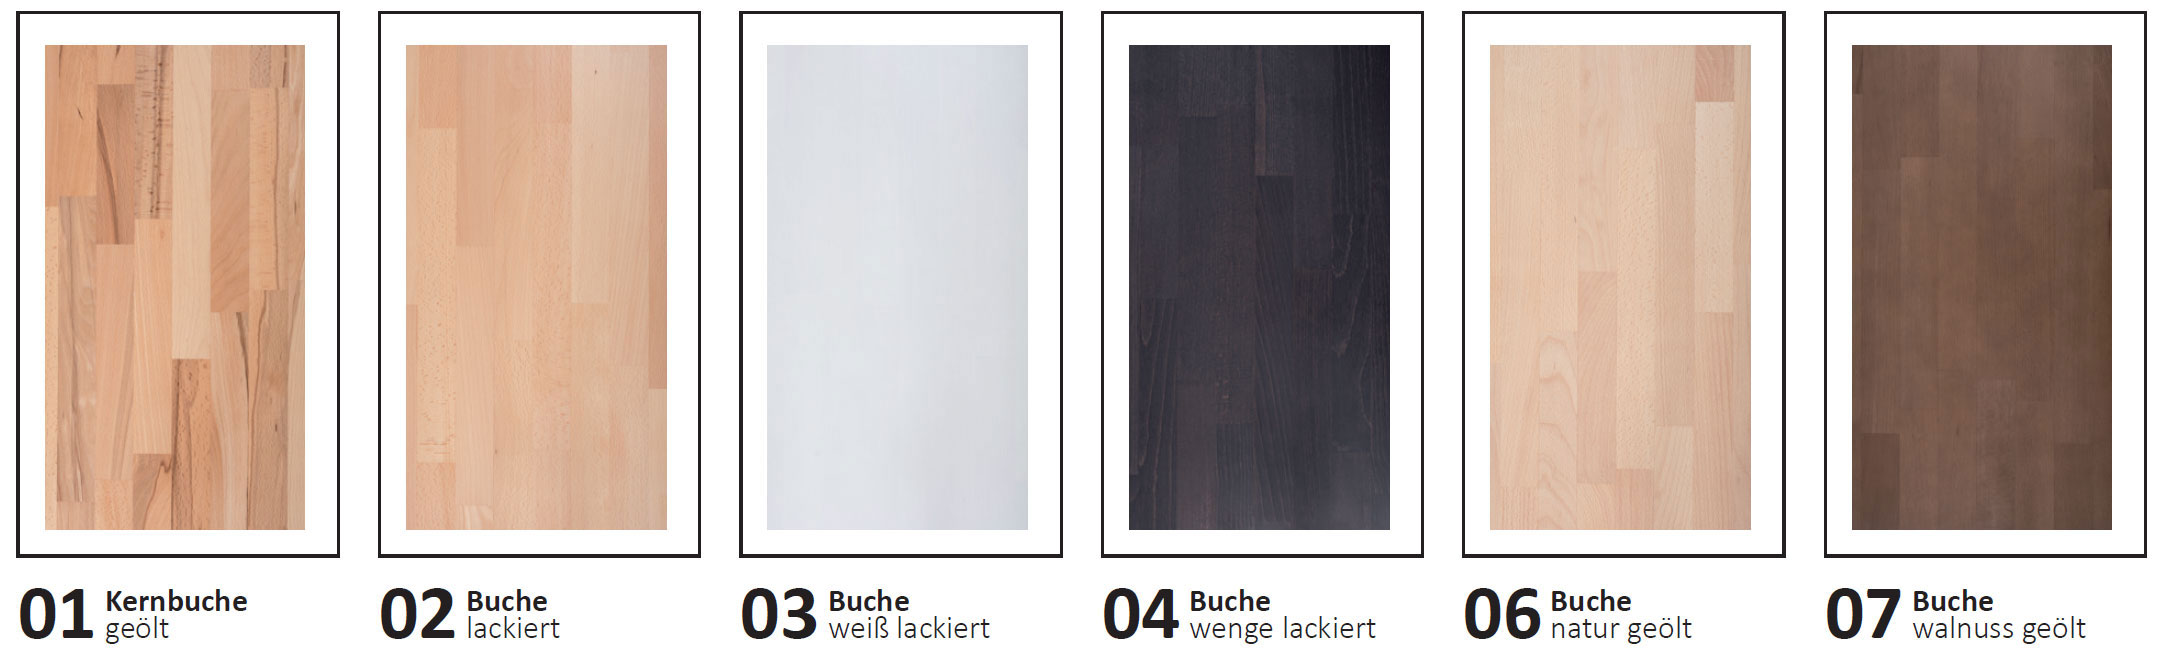 Dico Classic Massivholz Farben